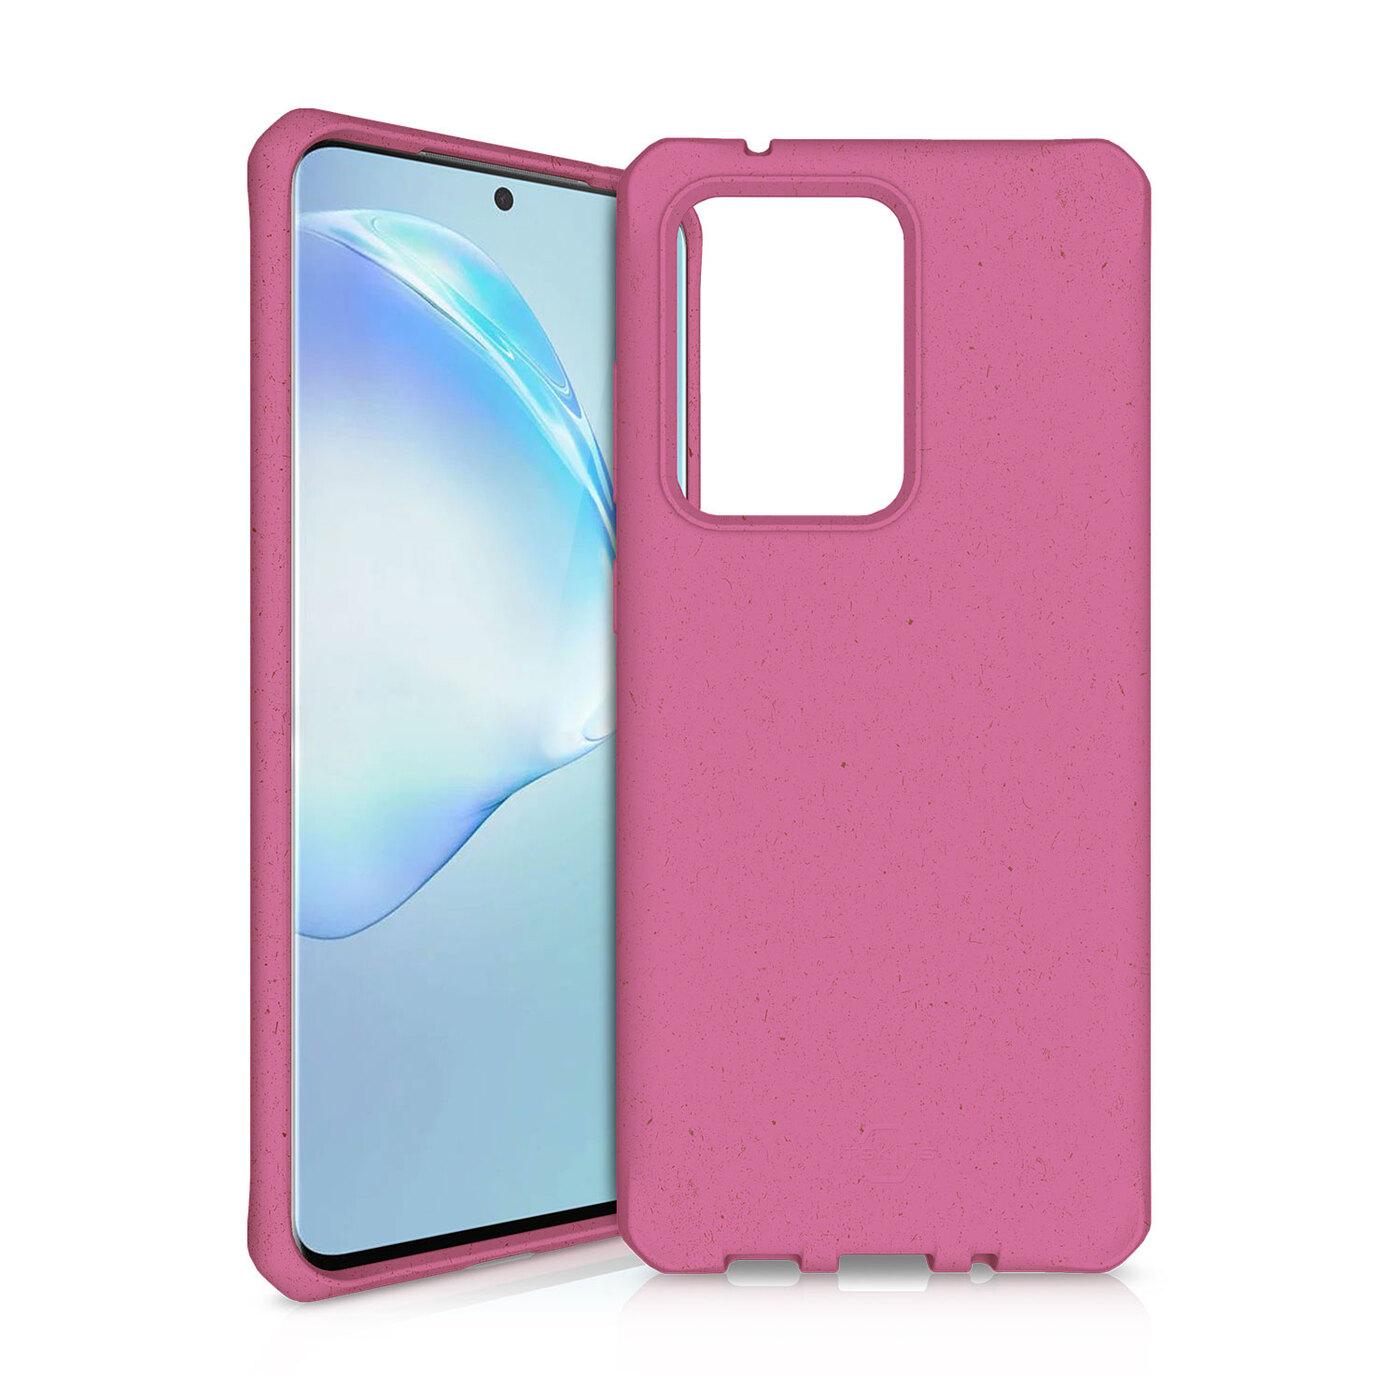 Чехол-накладка ITSKINS FERONIA BIO для Samsung Galaxy S20 Ultra, розовый